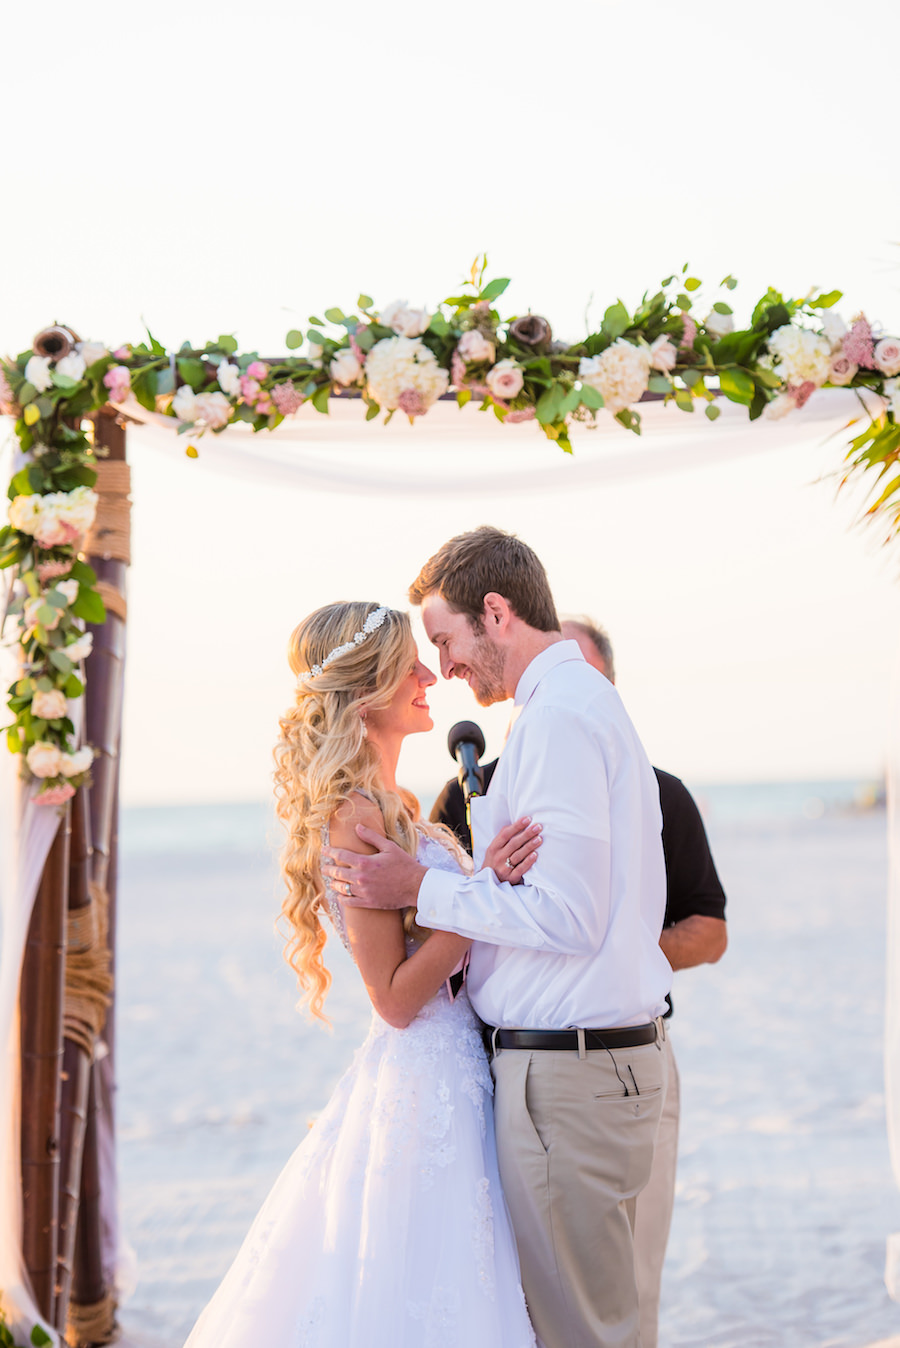 Bride and Groom Beach Wedding Ceremony Portrait | St. Pete Beach Florida Wedding Ceremony St. Pete Beach | Florida Beach Wedding Ceremony Prayer | Tampa Wedding Photographer Kera Photography